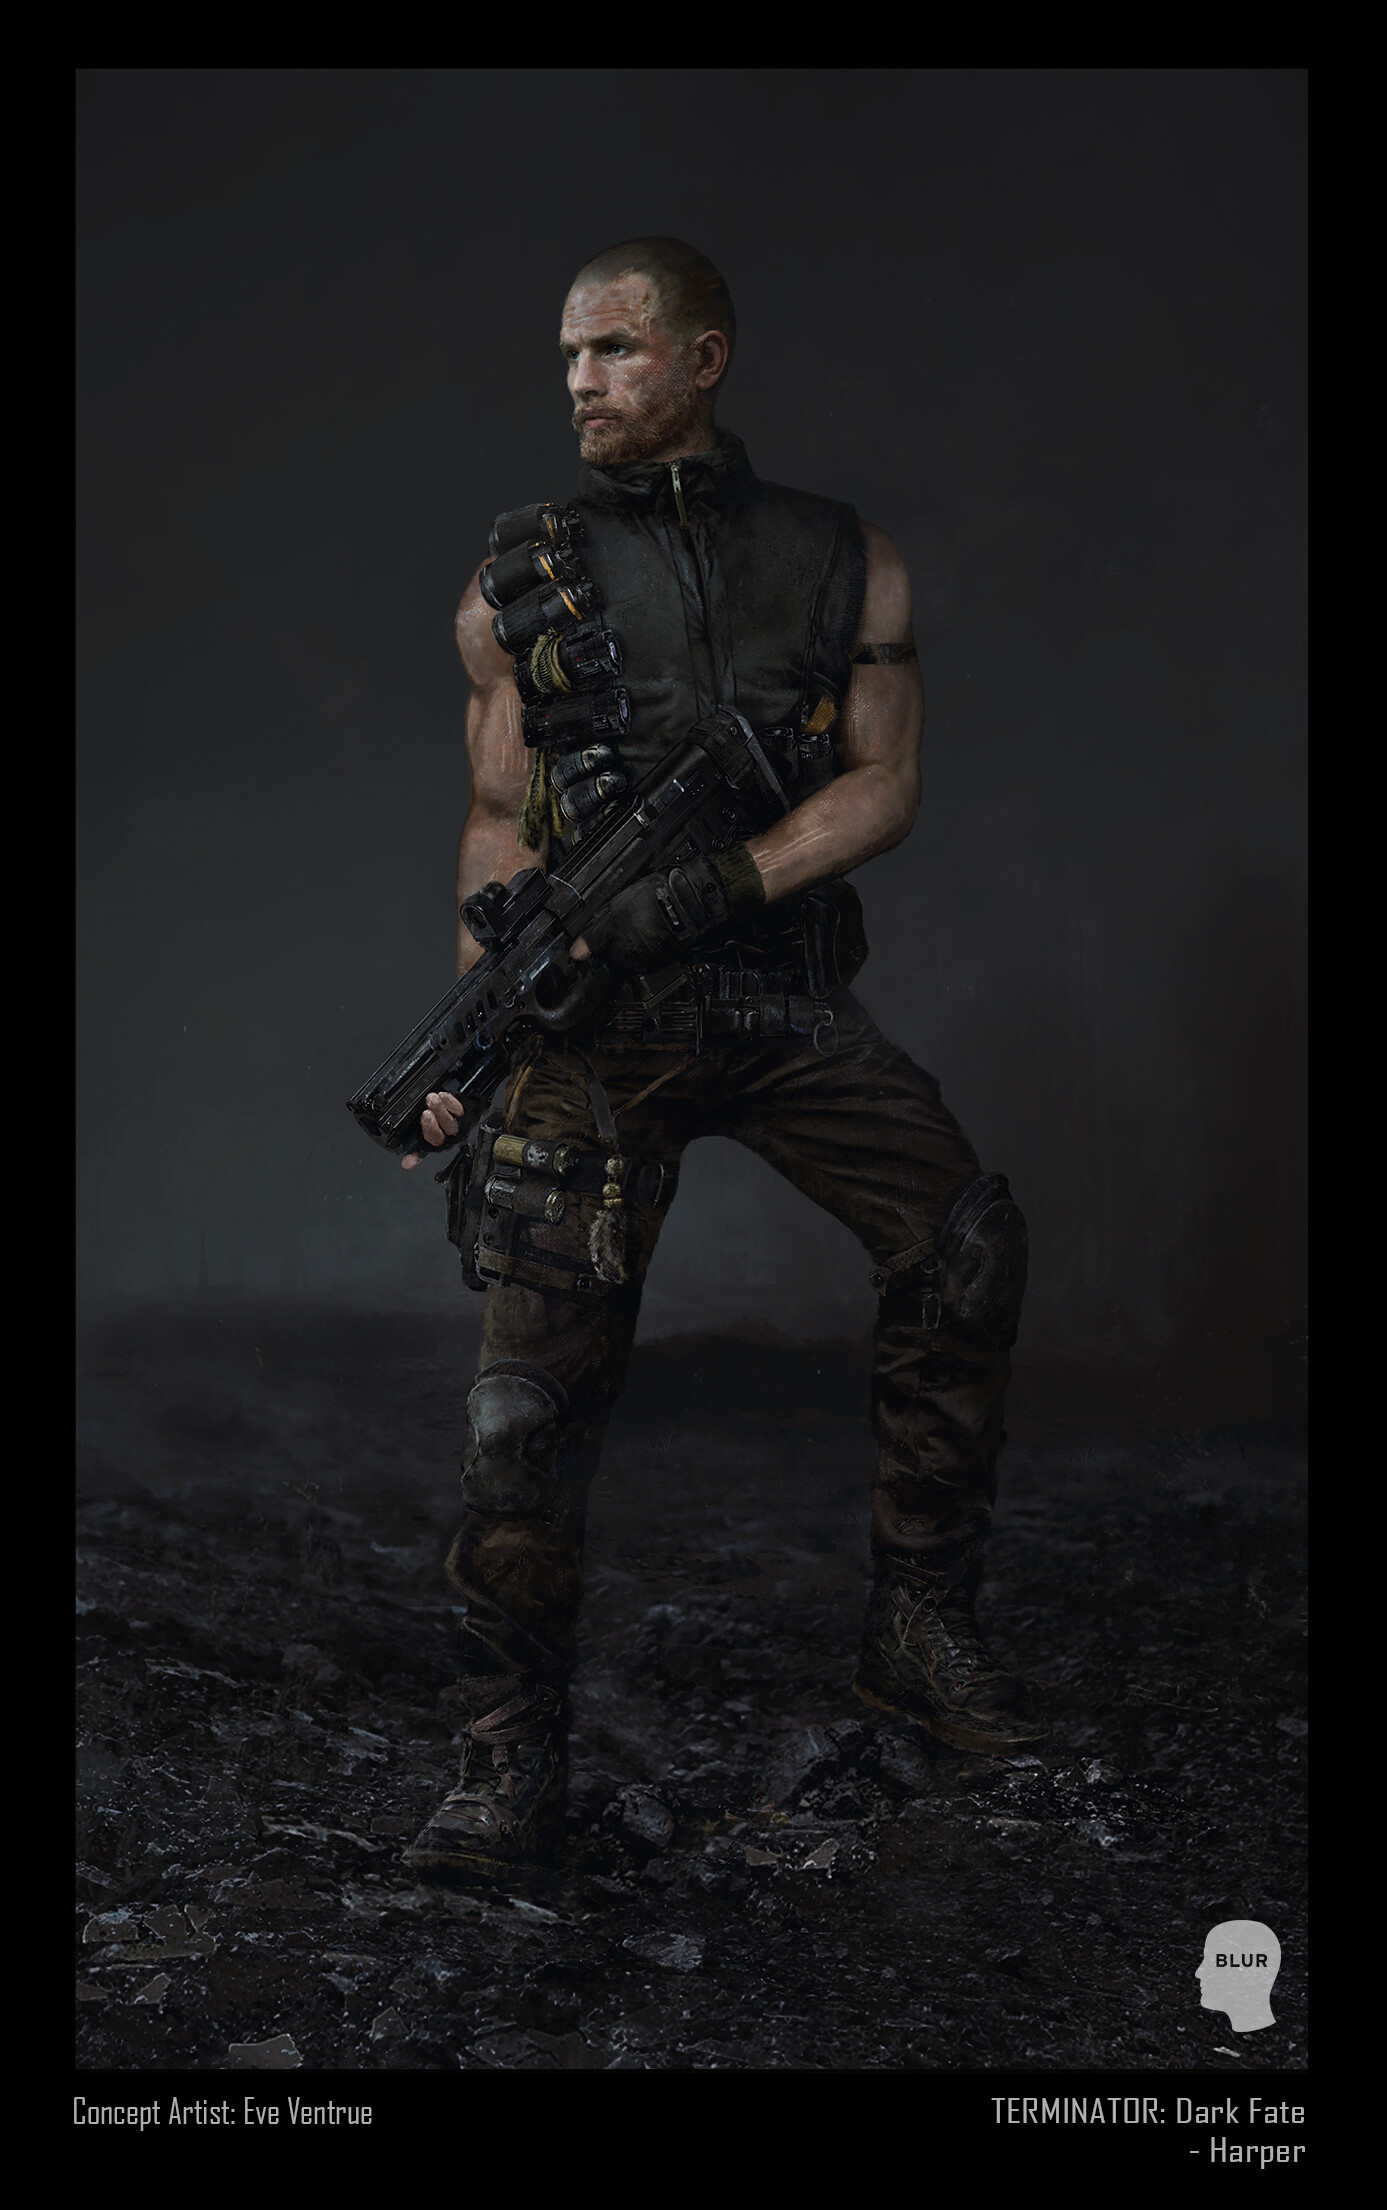 Concept Art And Logan Terminator